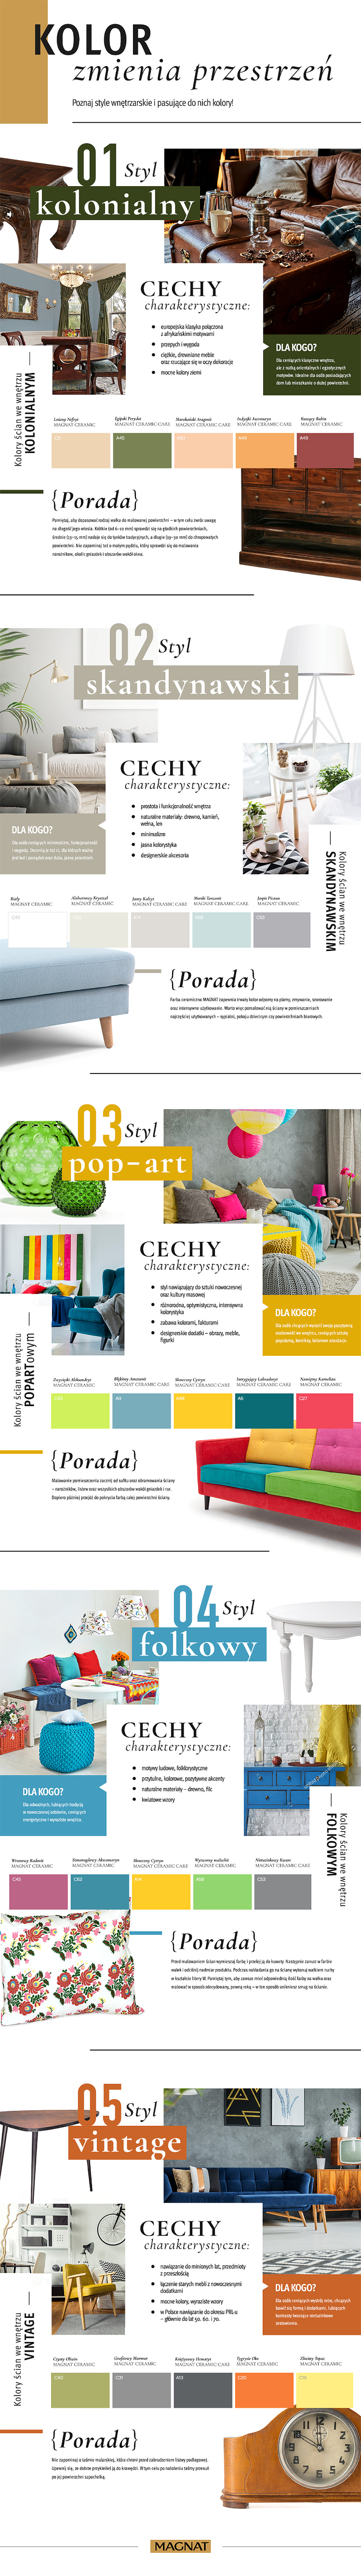 sniezka_infograf_style_allv3-3.jpg